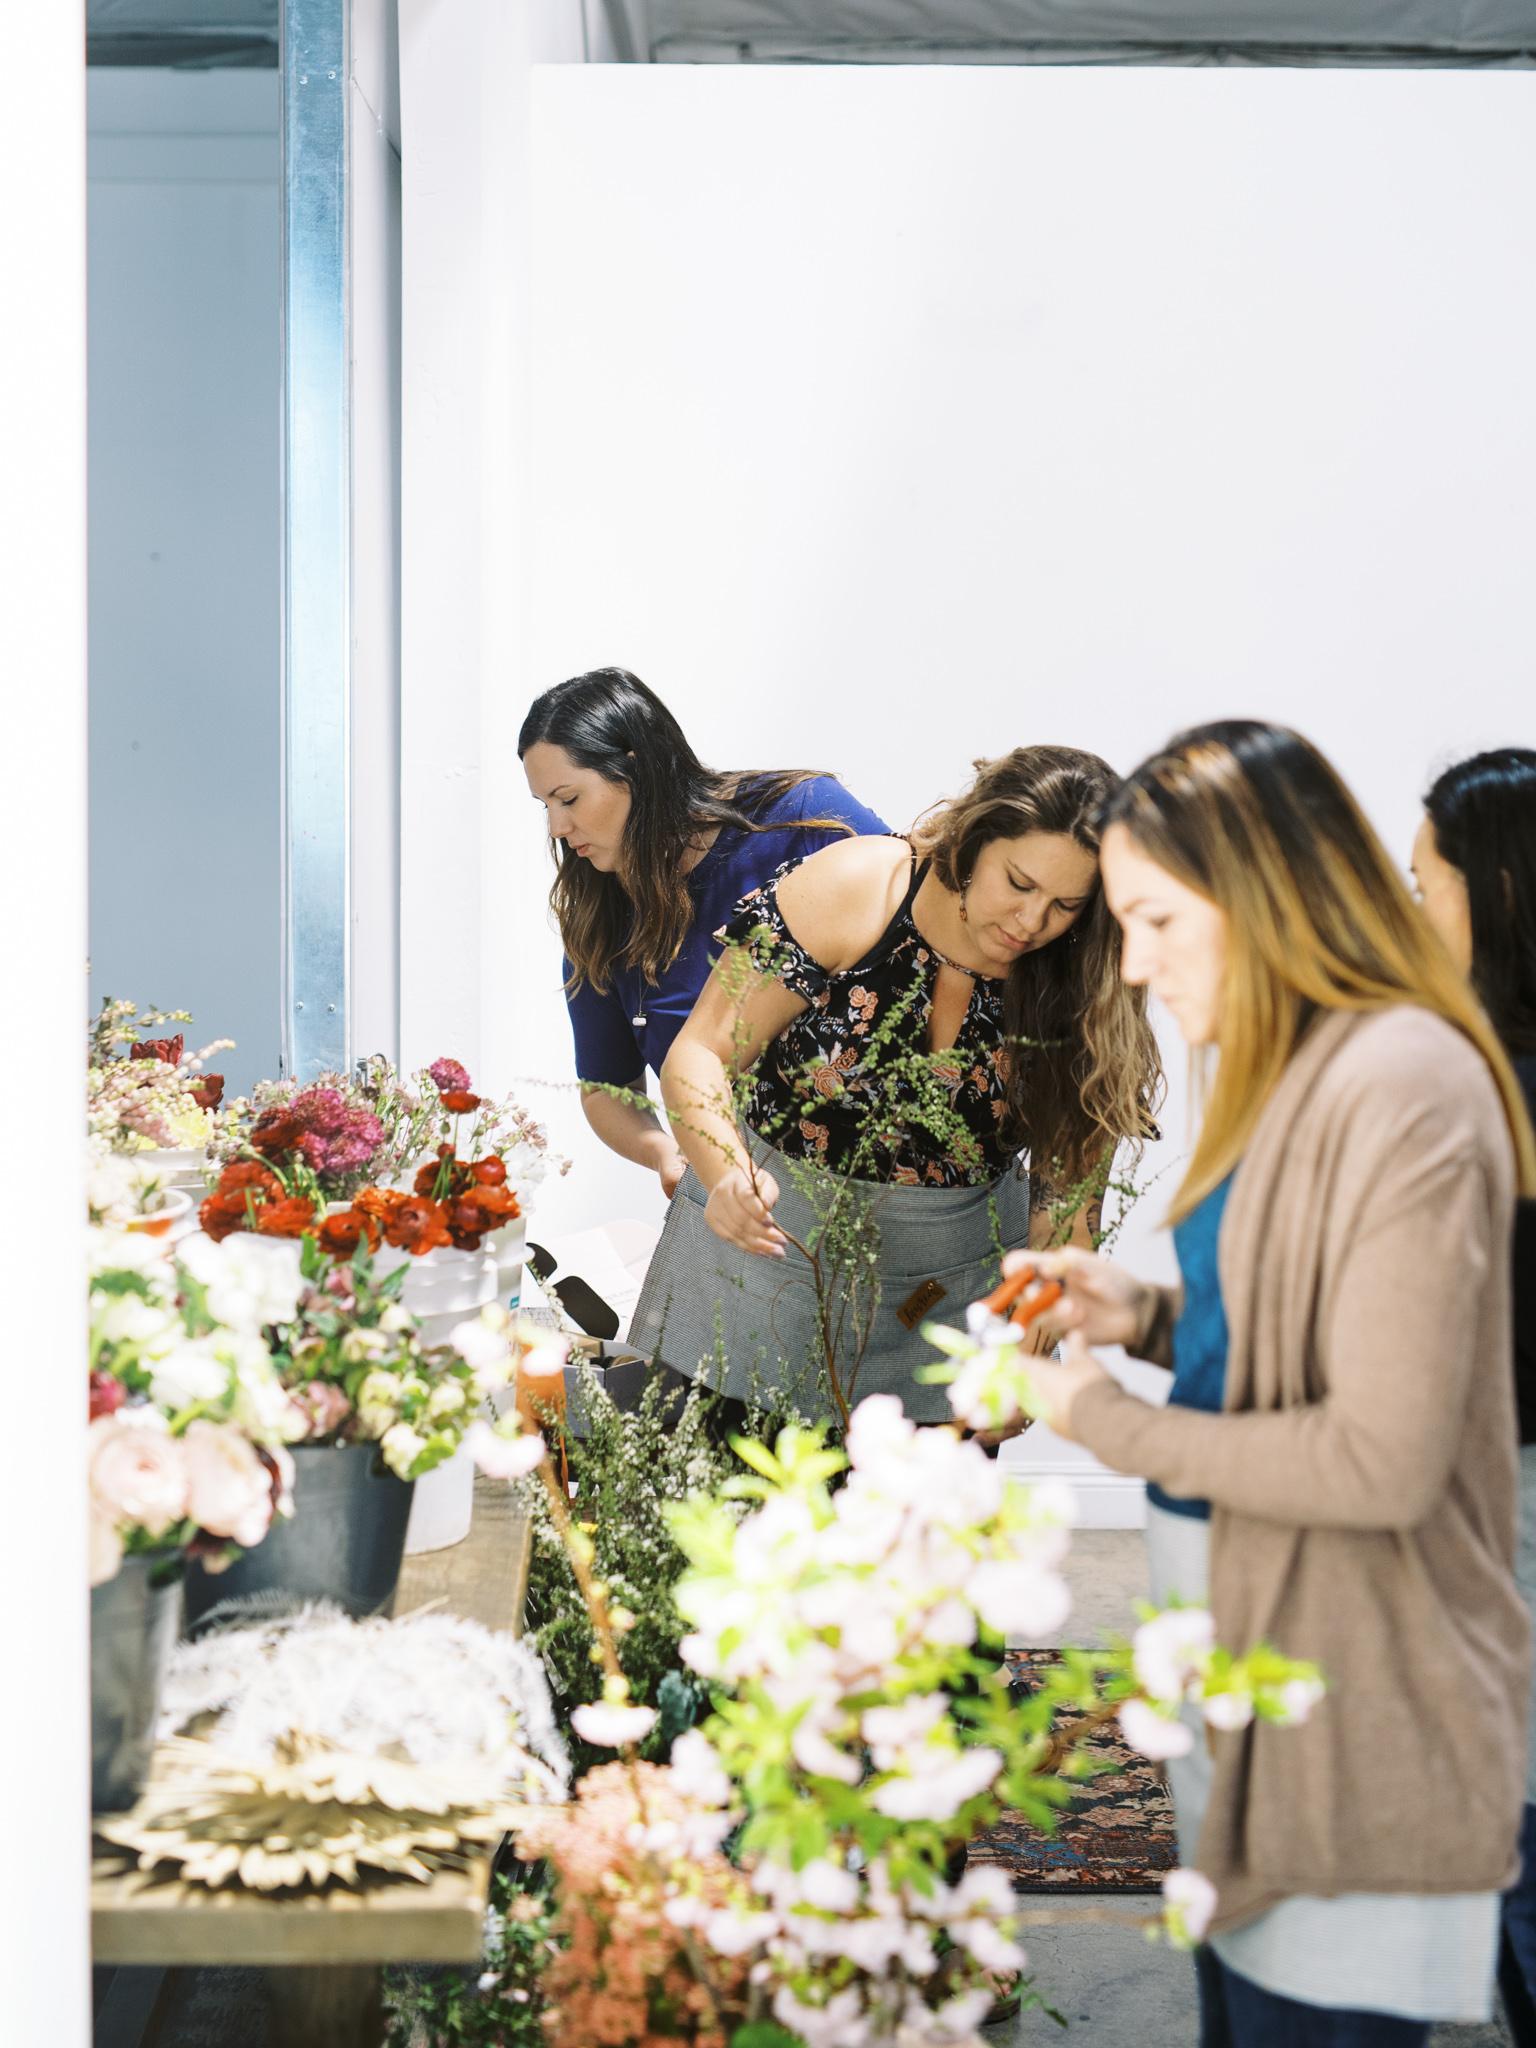 Cultivate Goods Floral Workshop - The Doyle - Kristen Krehbiel - Kristen Kay Photography-1.jpg